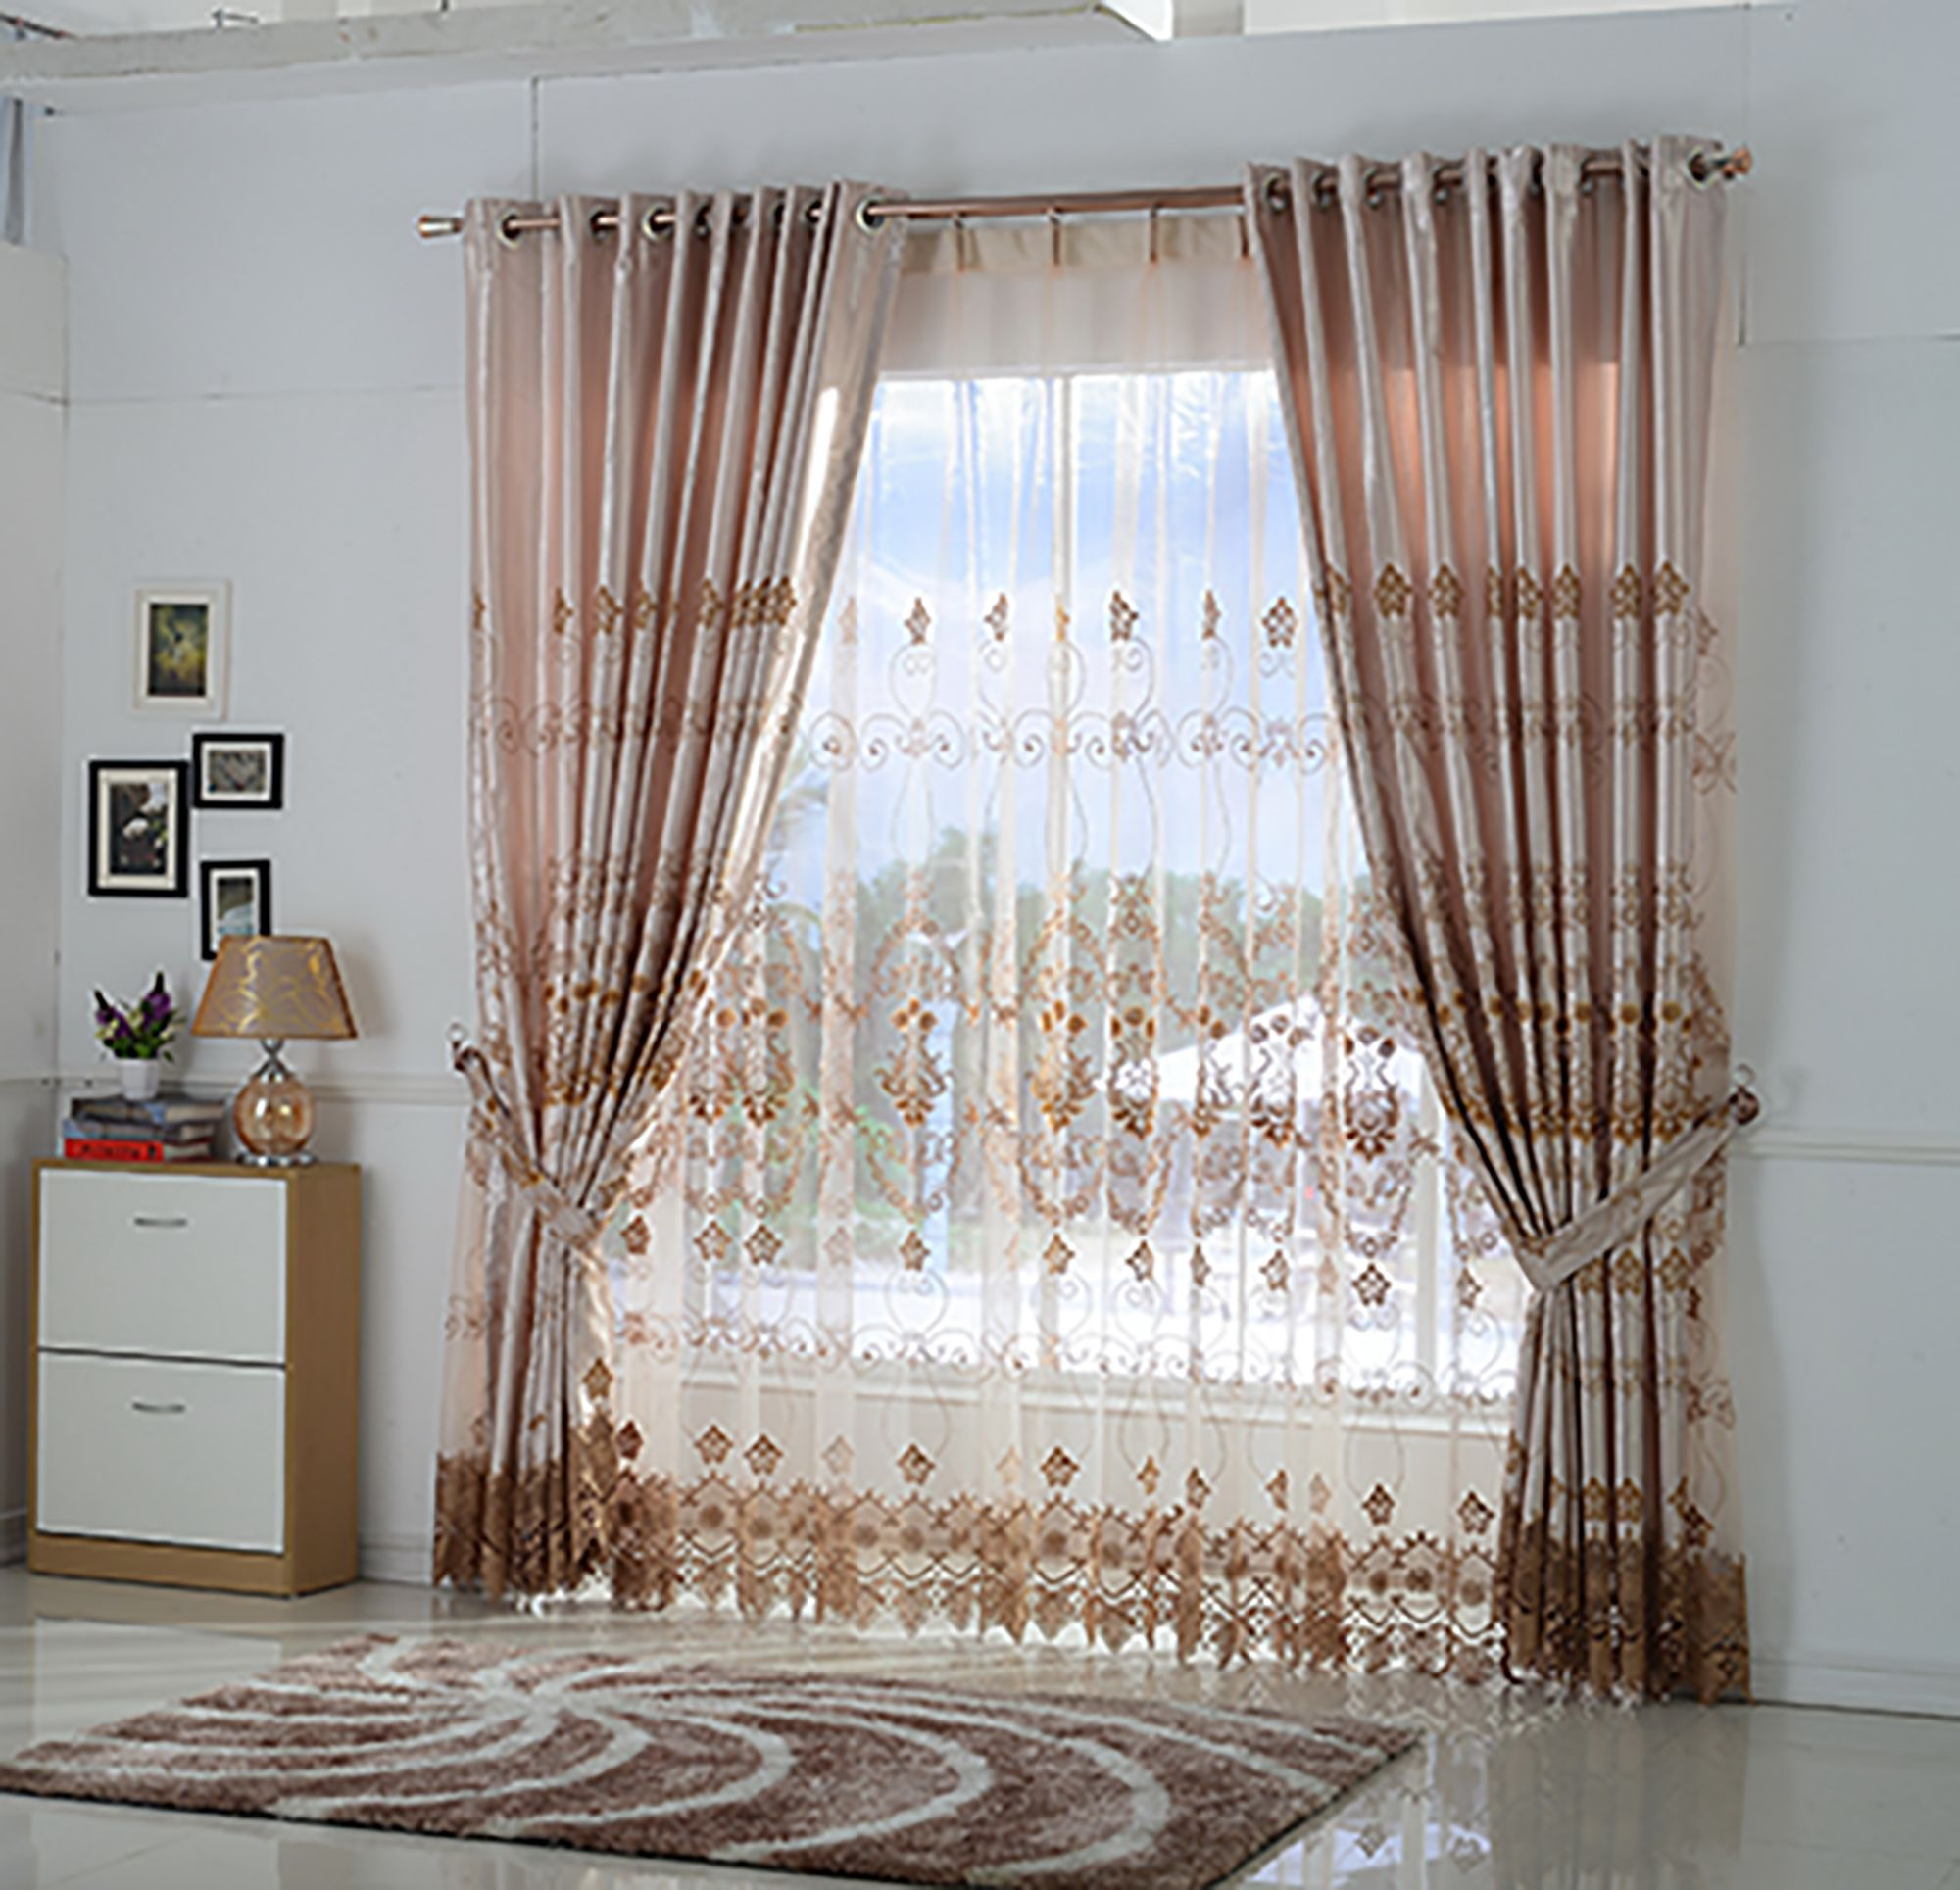 Window curtain rods modern - Modern Curtain Rods Modern Curtains Window Curtains